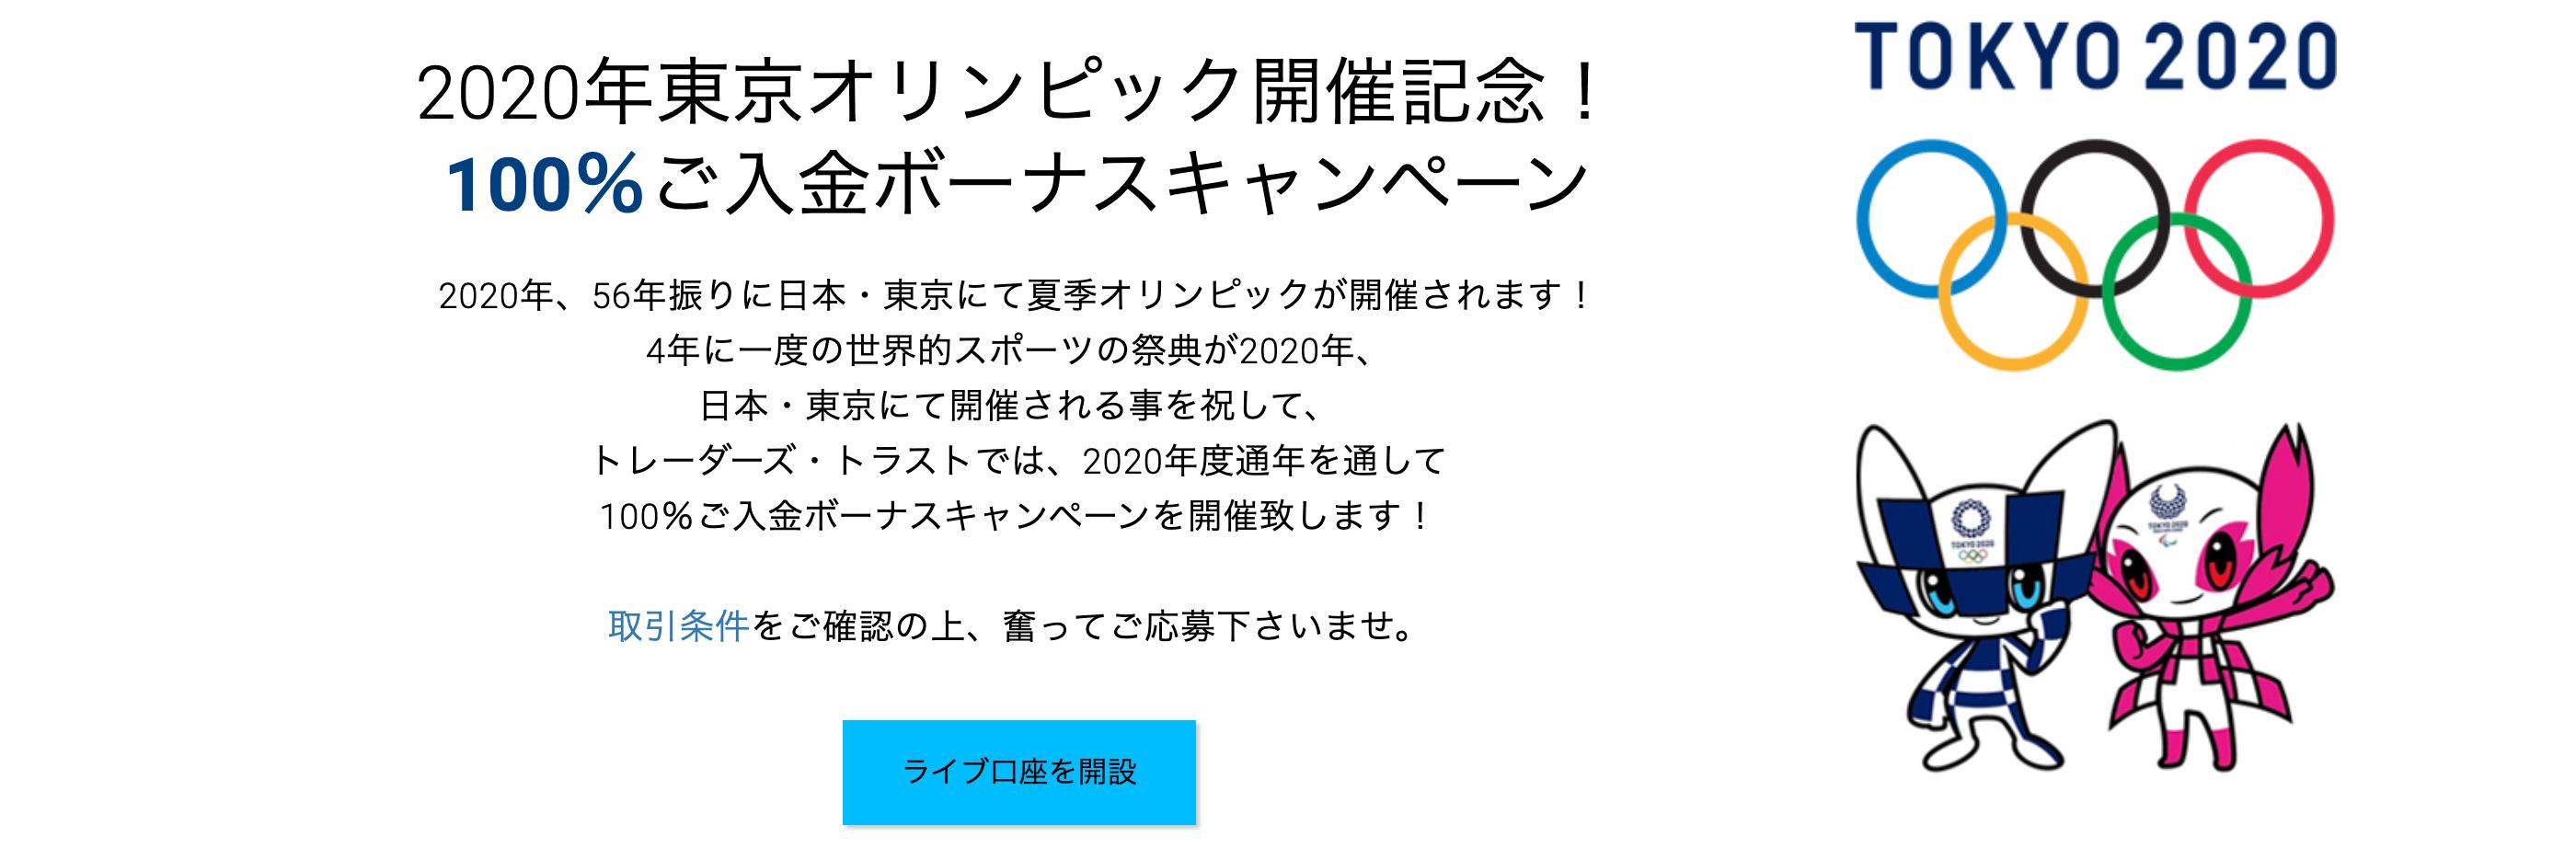 TradersTrust2020東京・100%入金ボーナス